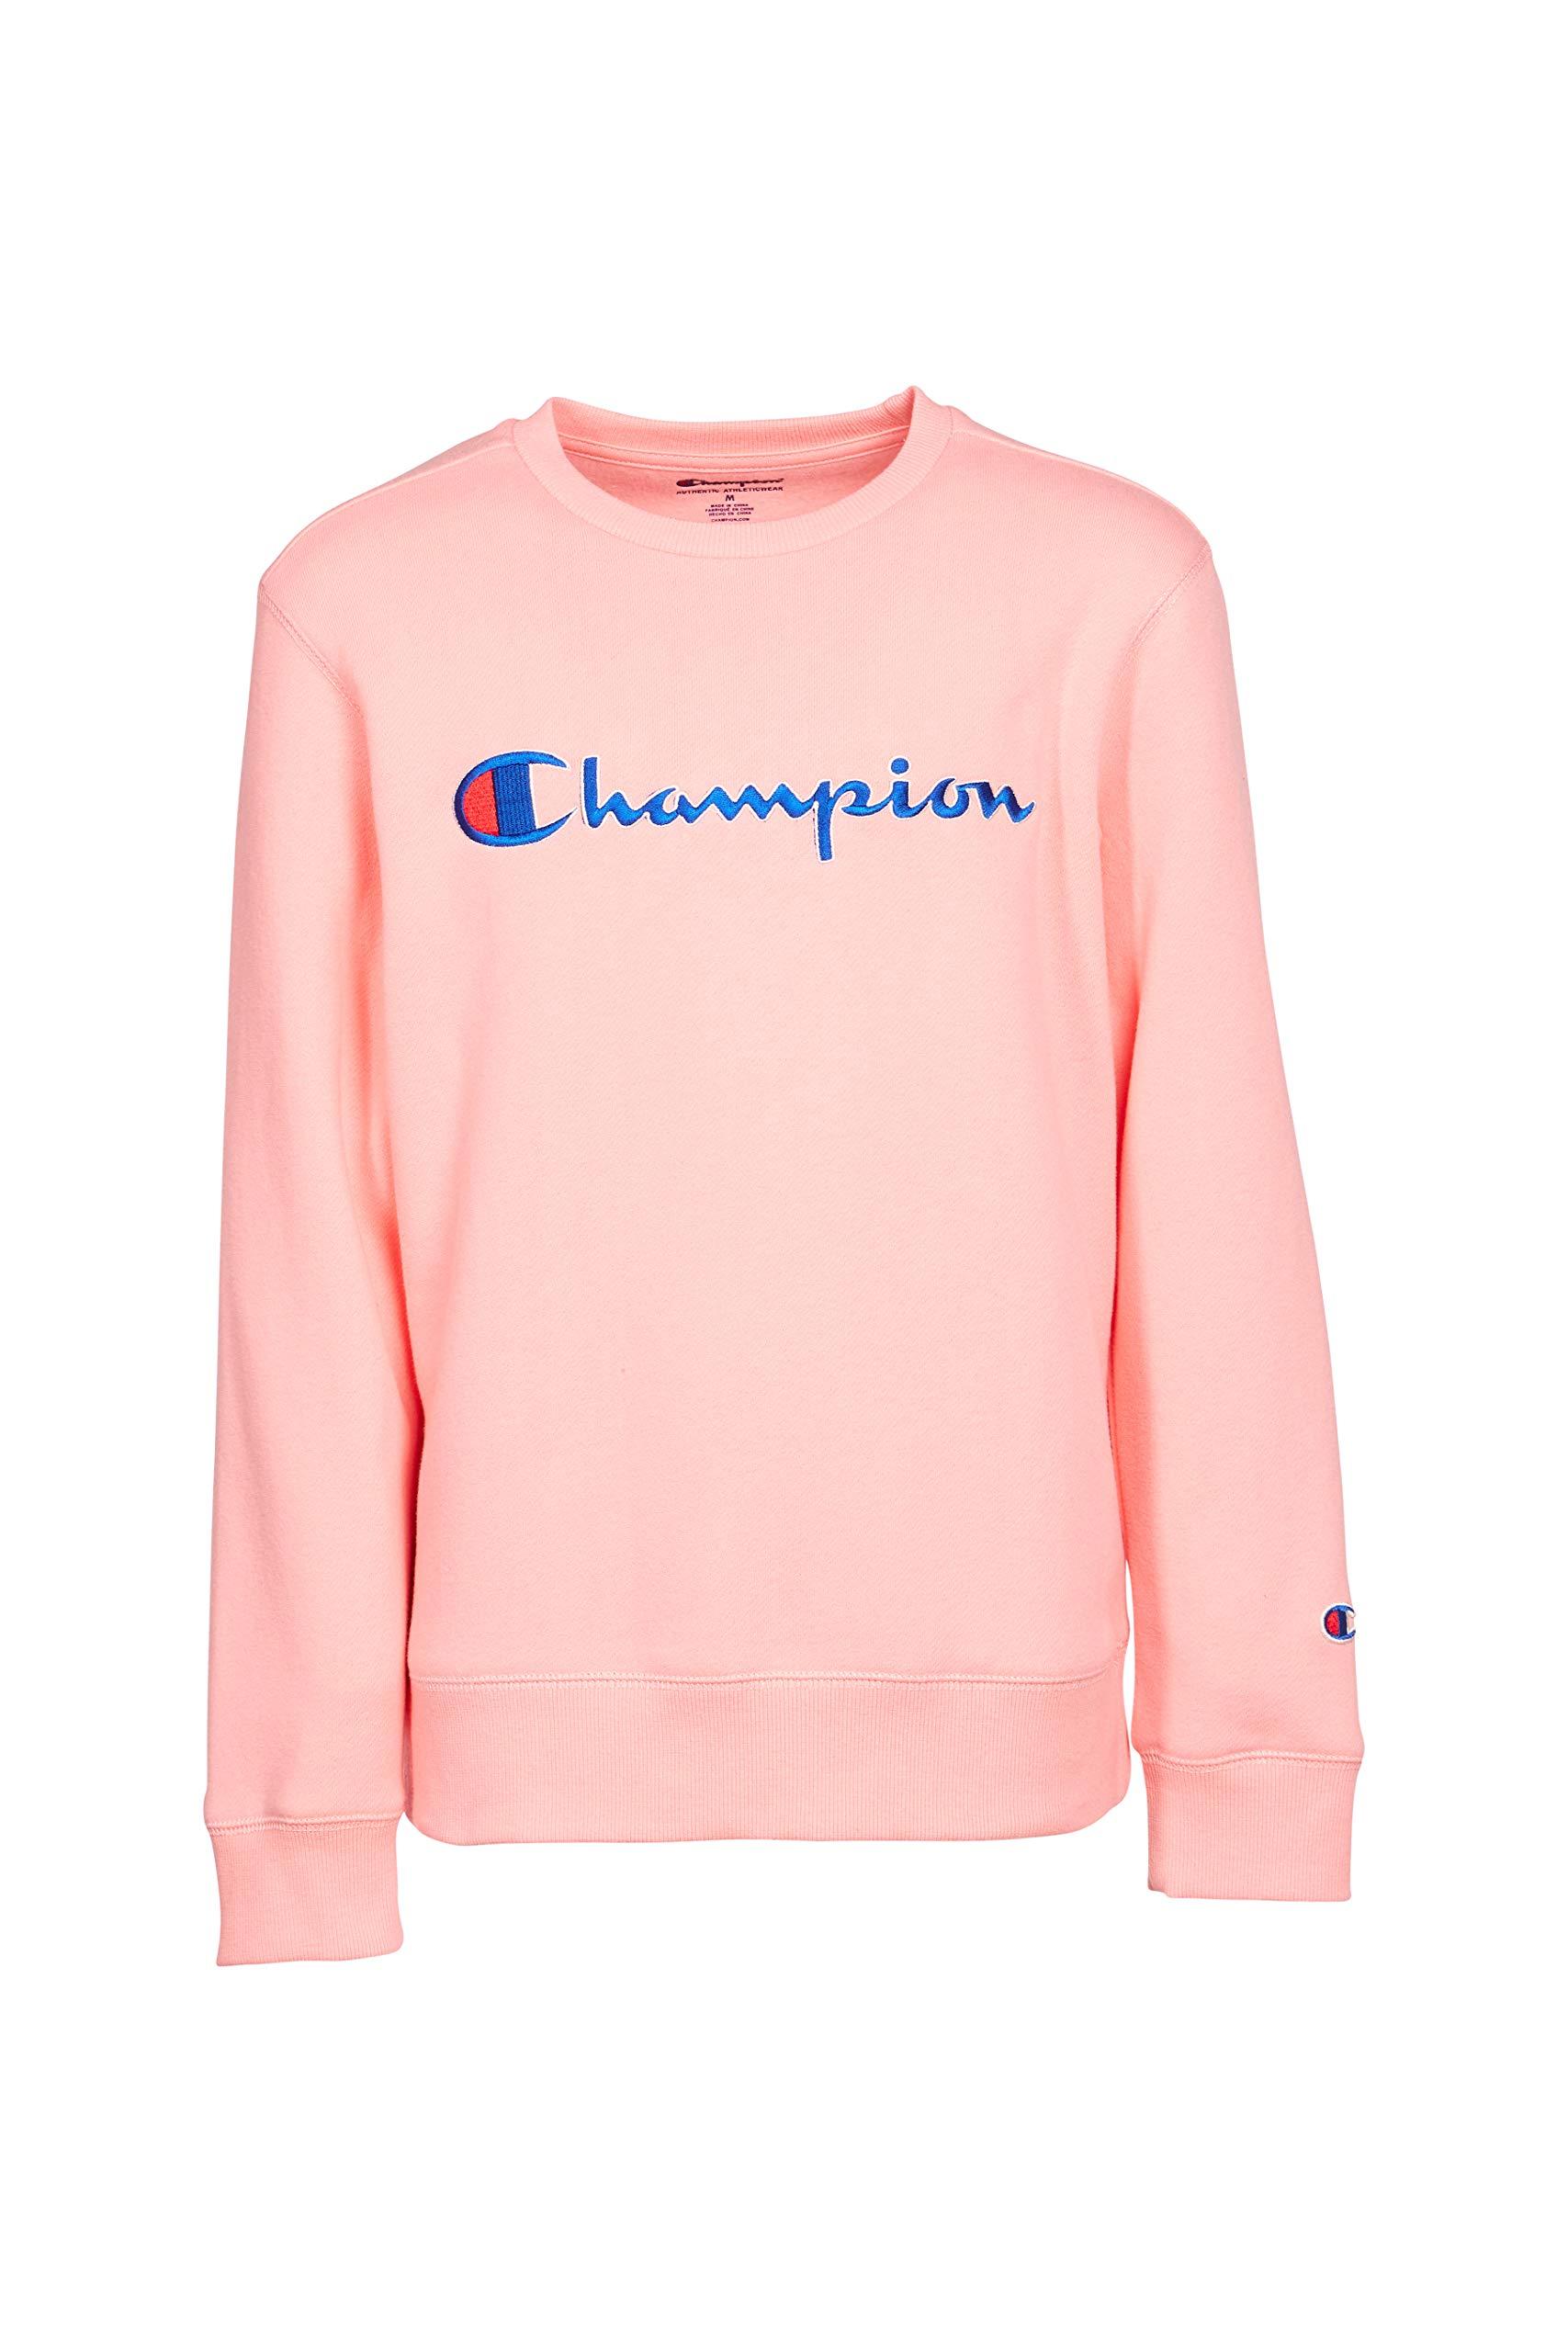 Champion Unisex Heritage Boy and Girls Fleece Pullover Champion Scipt Sweatshirt